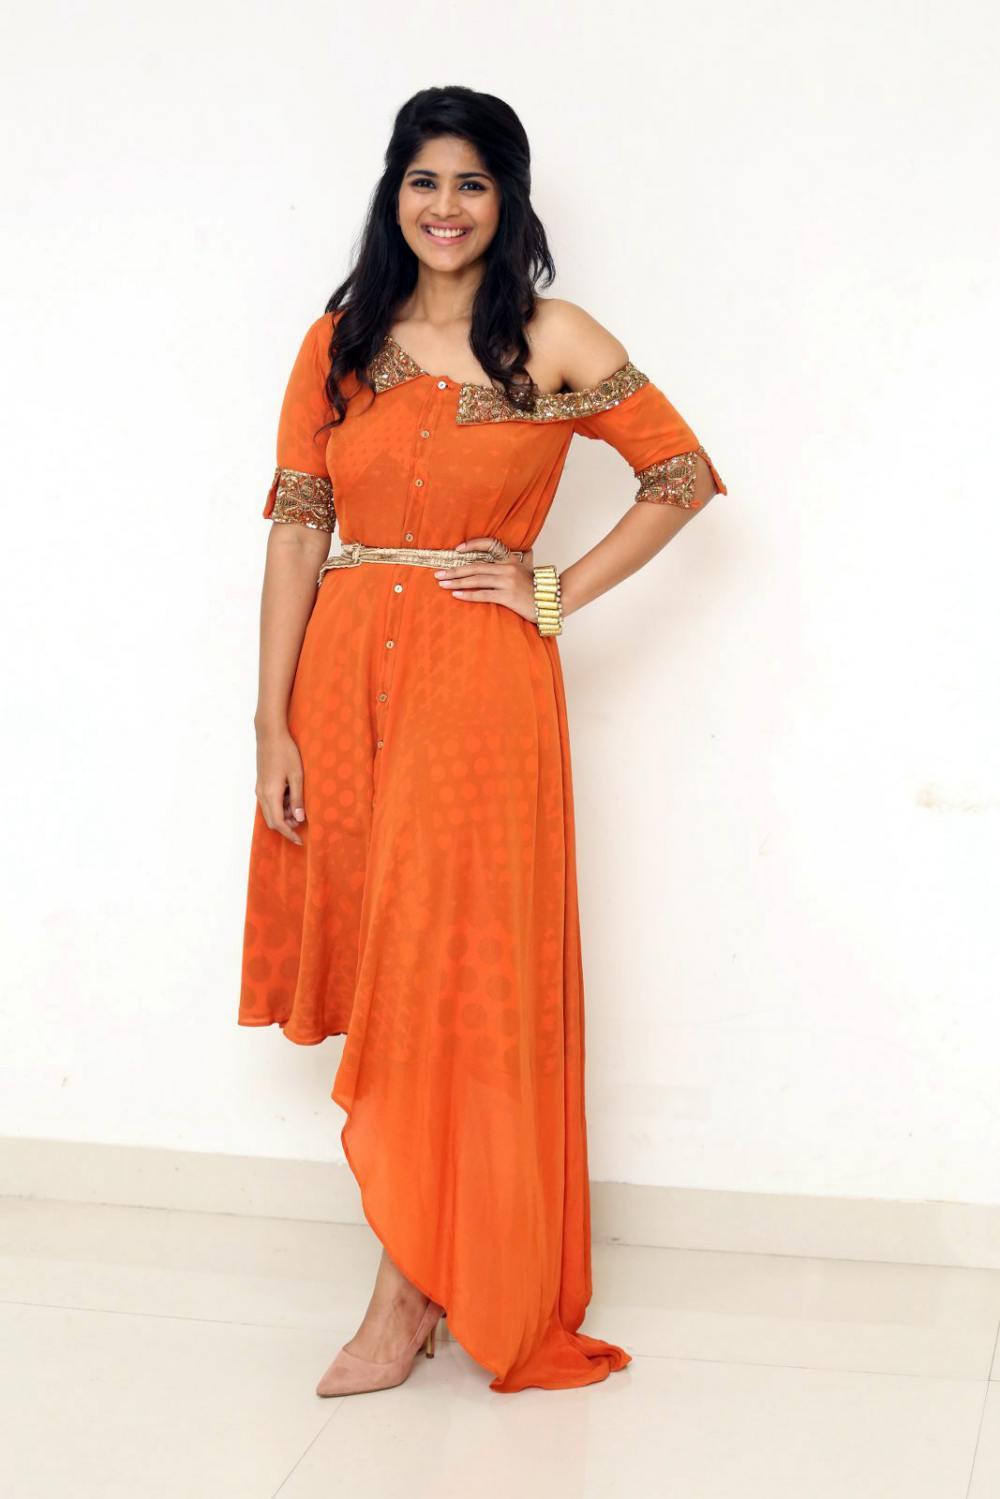 Megha Akash at peta movie audio launch (12)